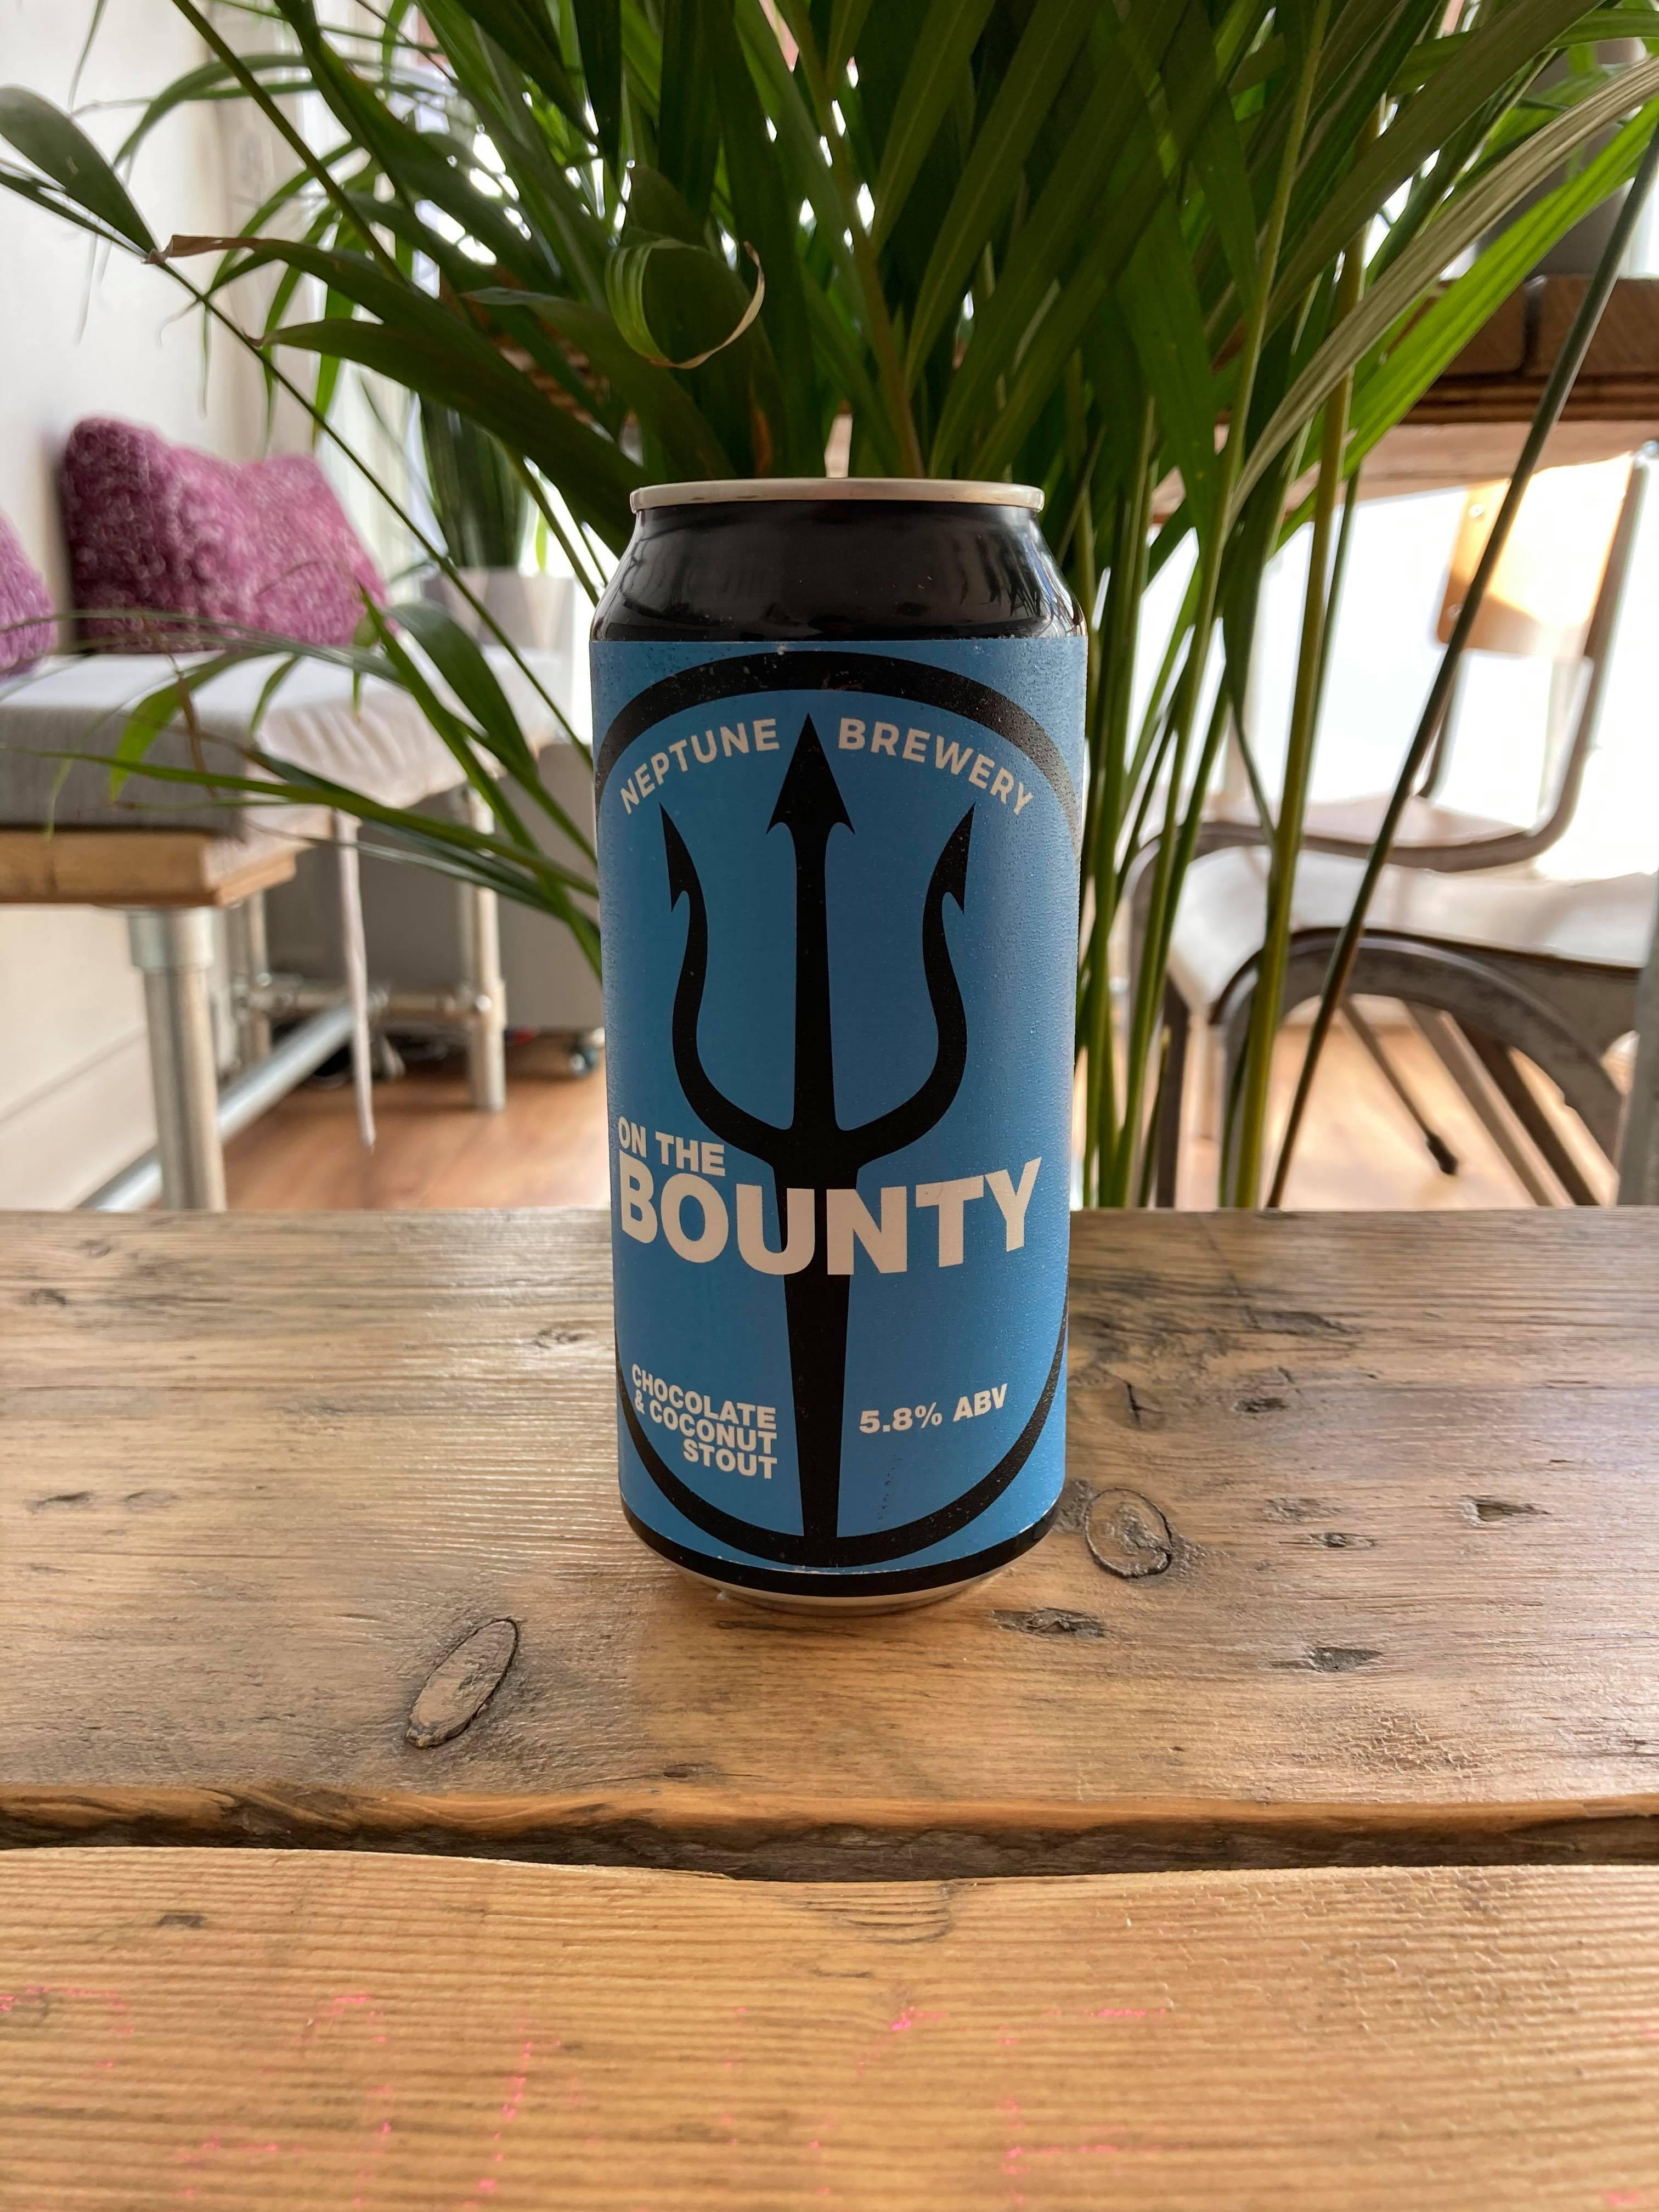 Neptune - On The Bounty 5.8%